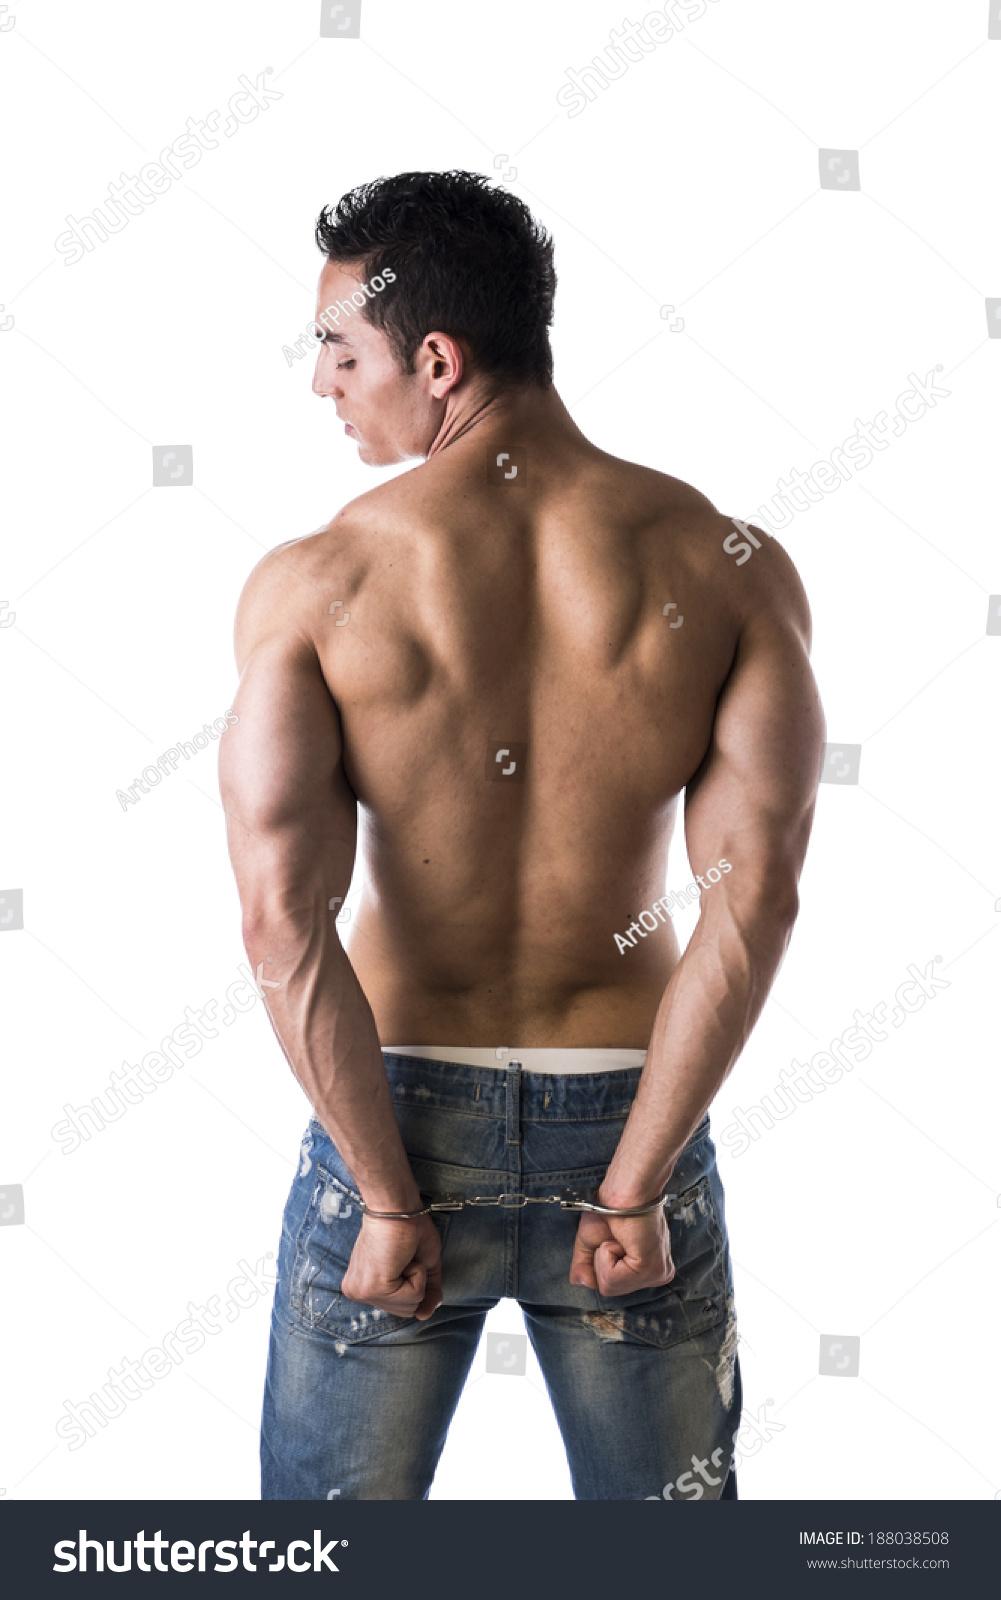 Body Bilder Fuck Pic 28